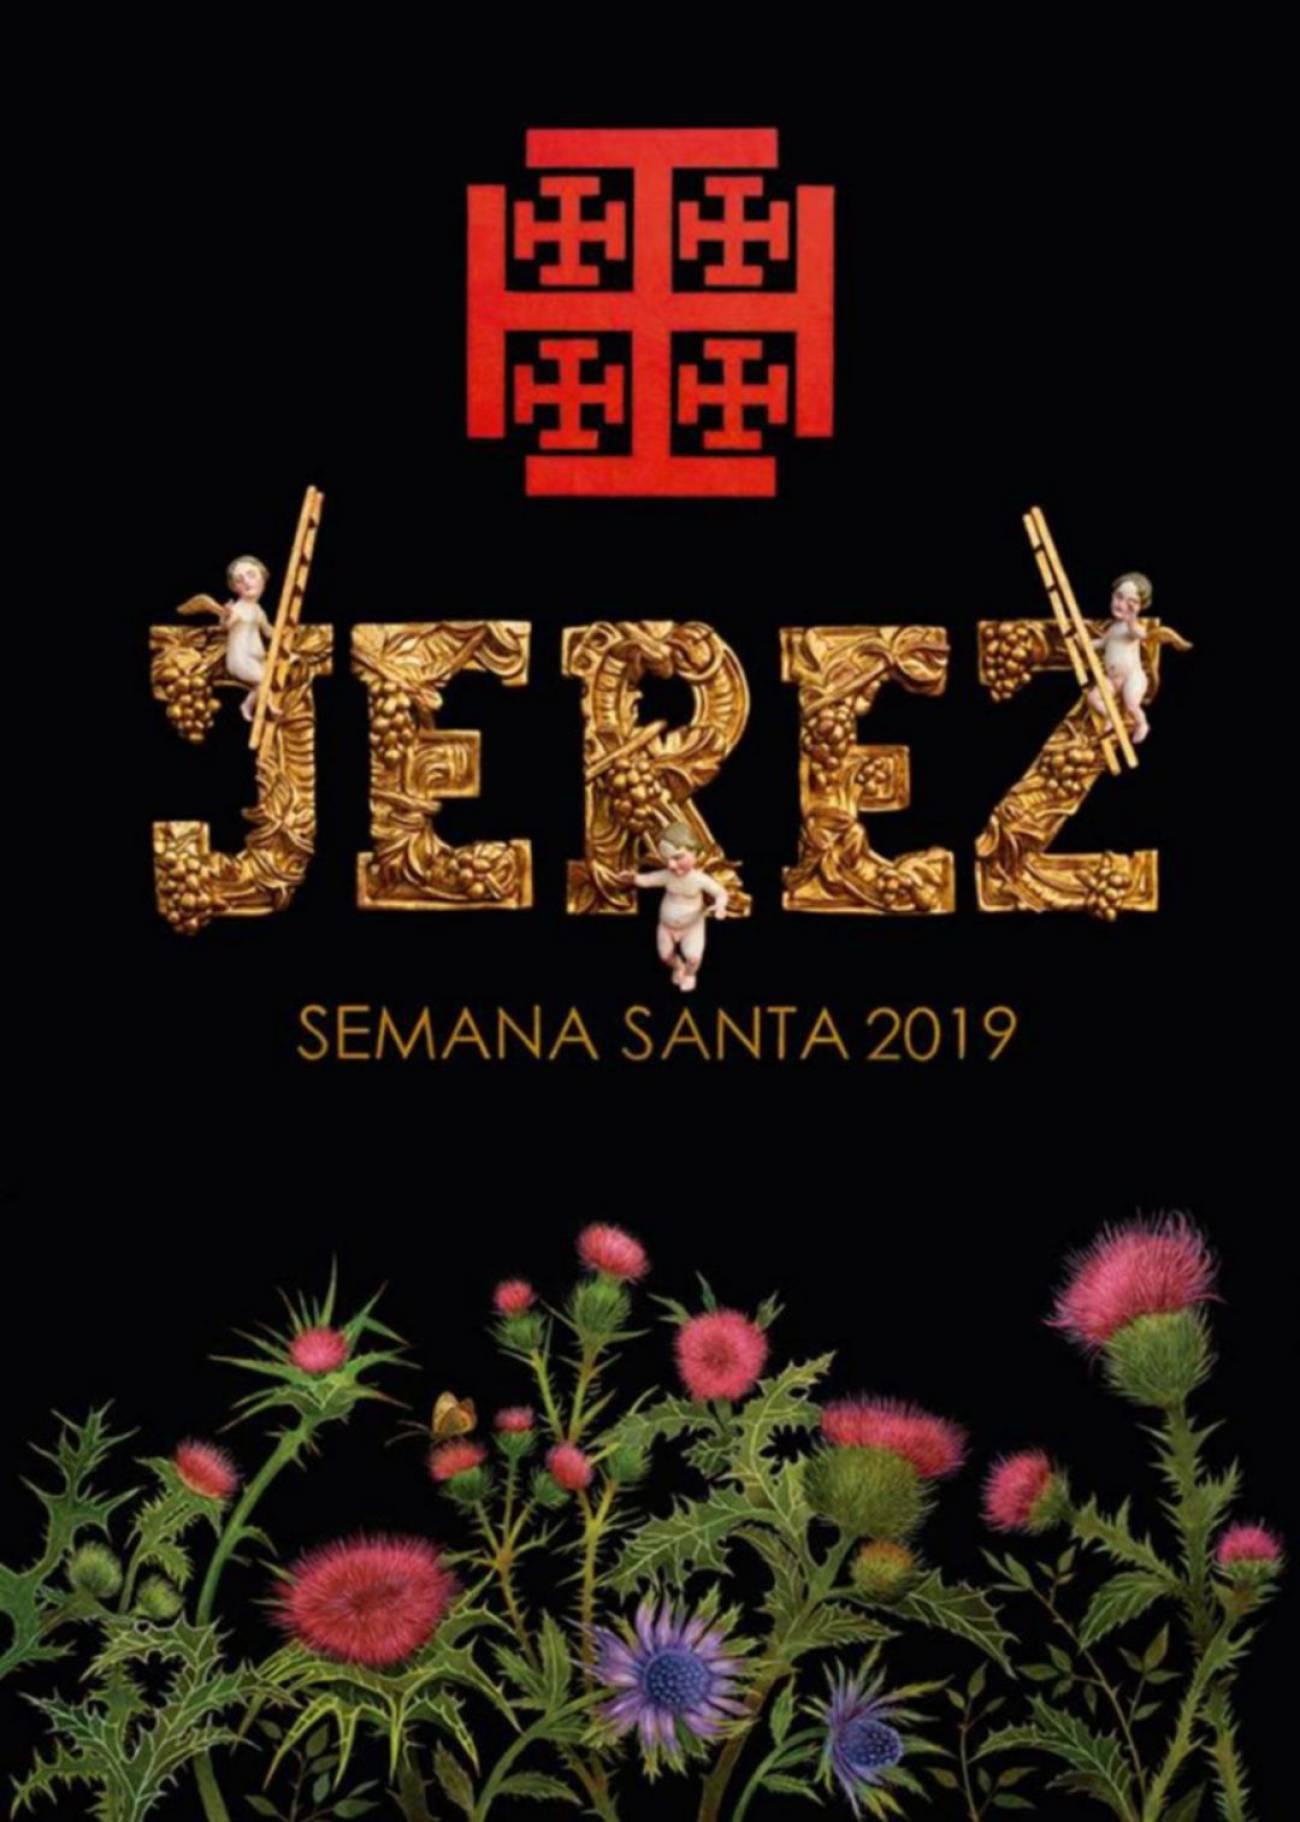 cartel-semana-santa-jerez-2019